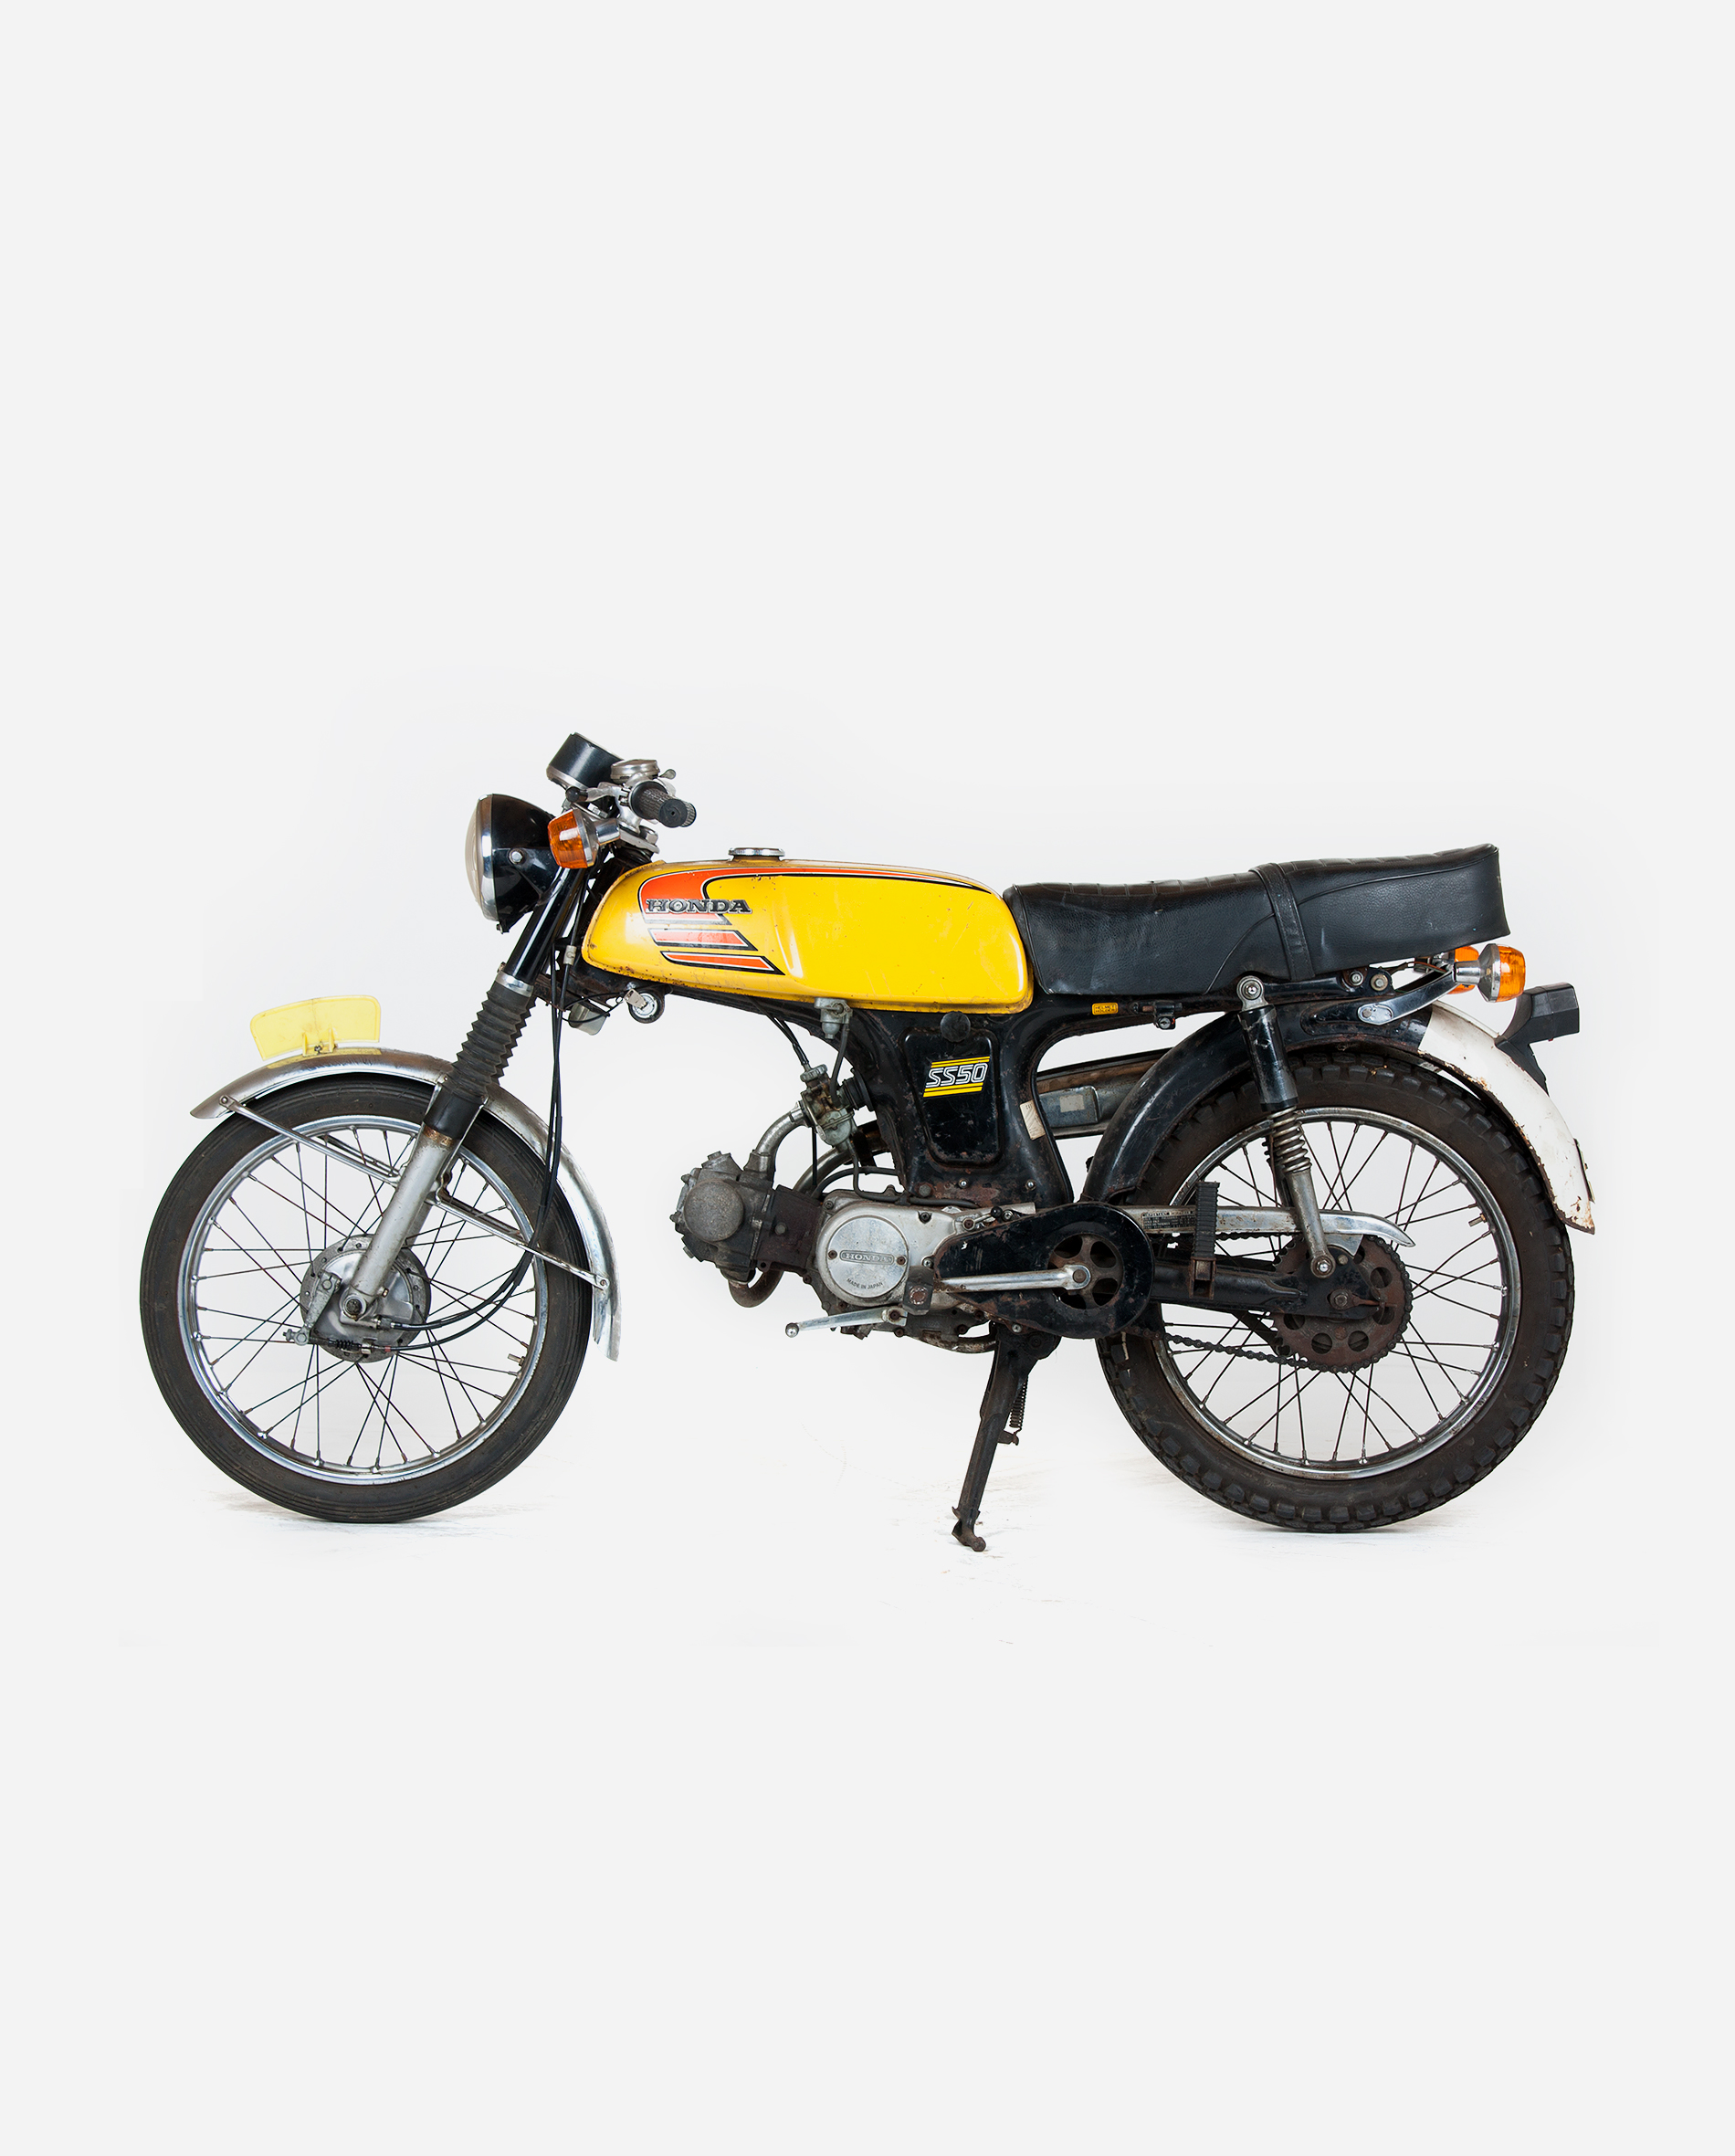 Honda-ss50-zeer-origineel-l · Fourstrokebarn